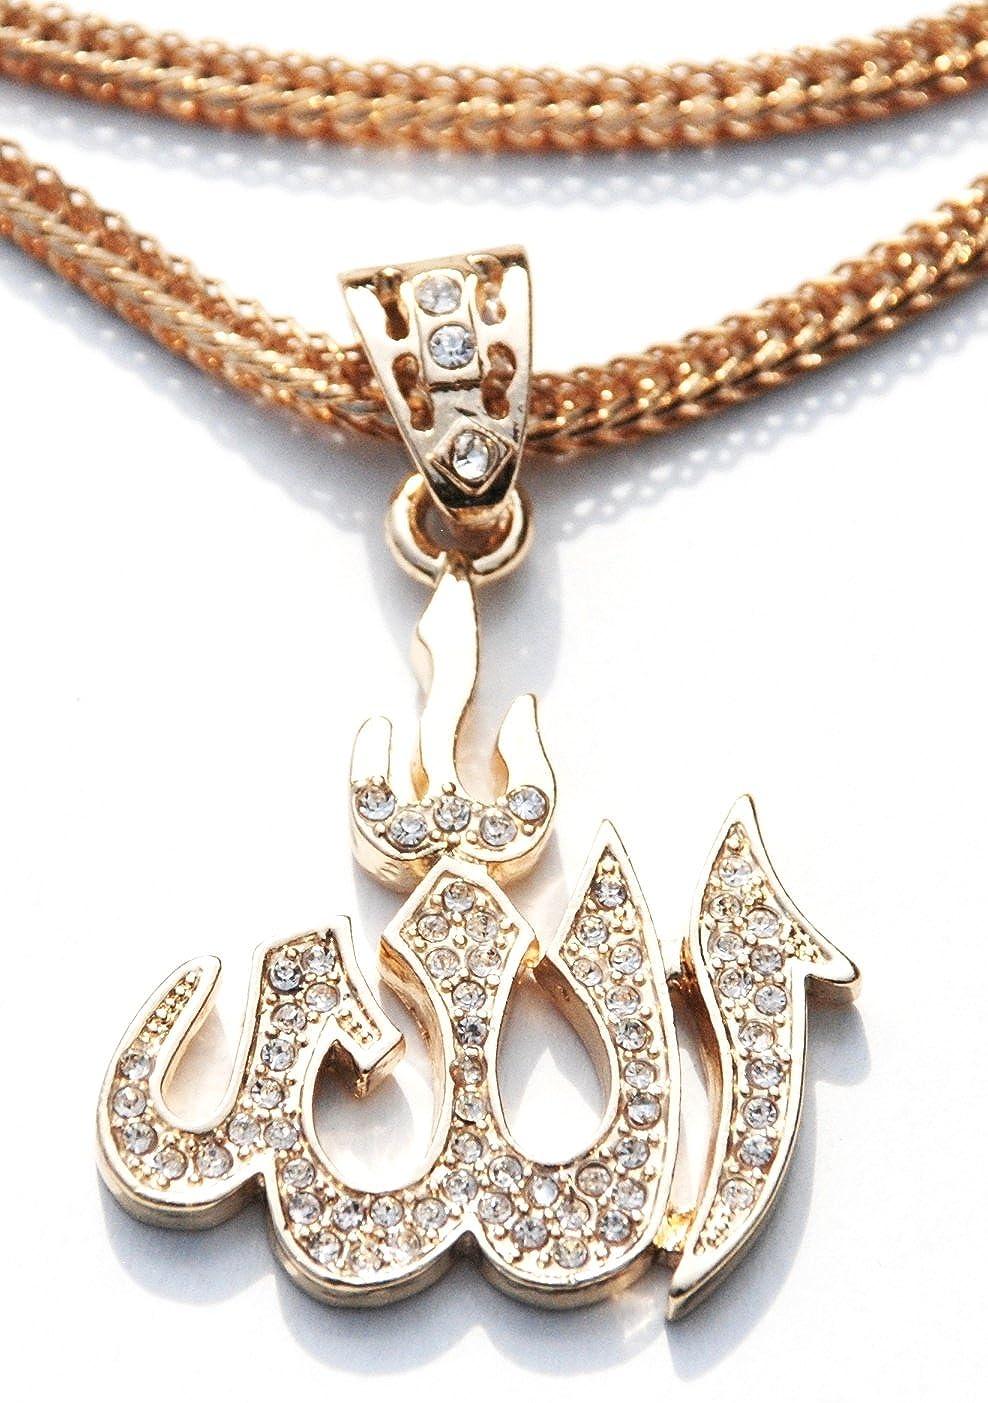 Muslim Jewelry Beautiful Shiny Gold Allah Pendant With Rhinestones On Gold 24-ich Chain